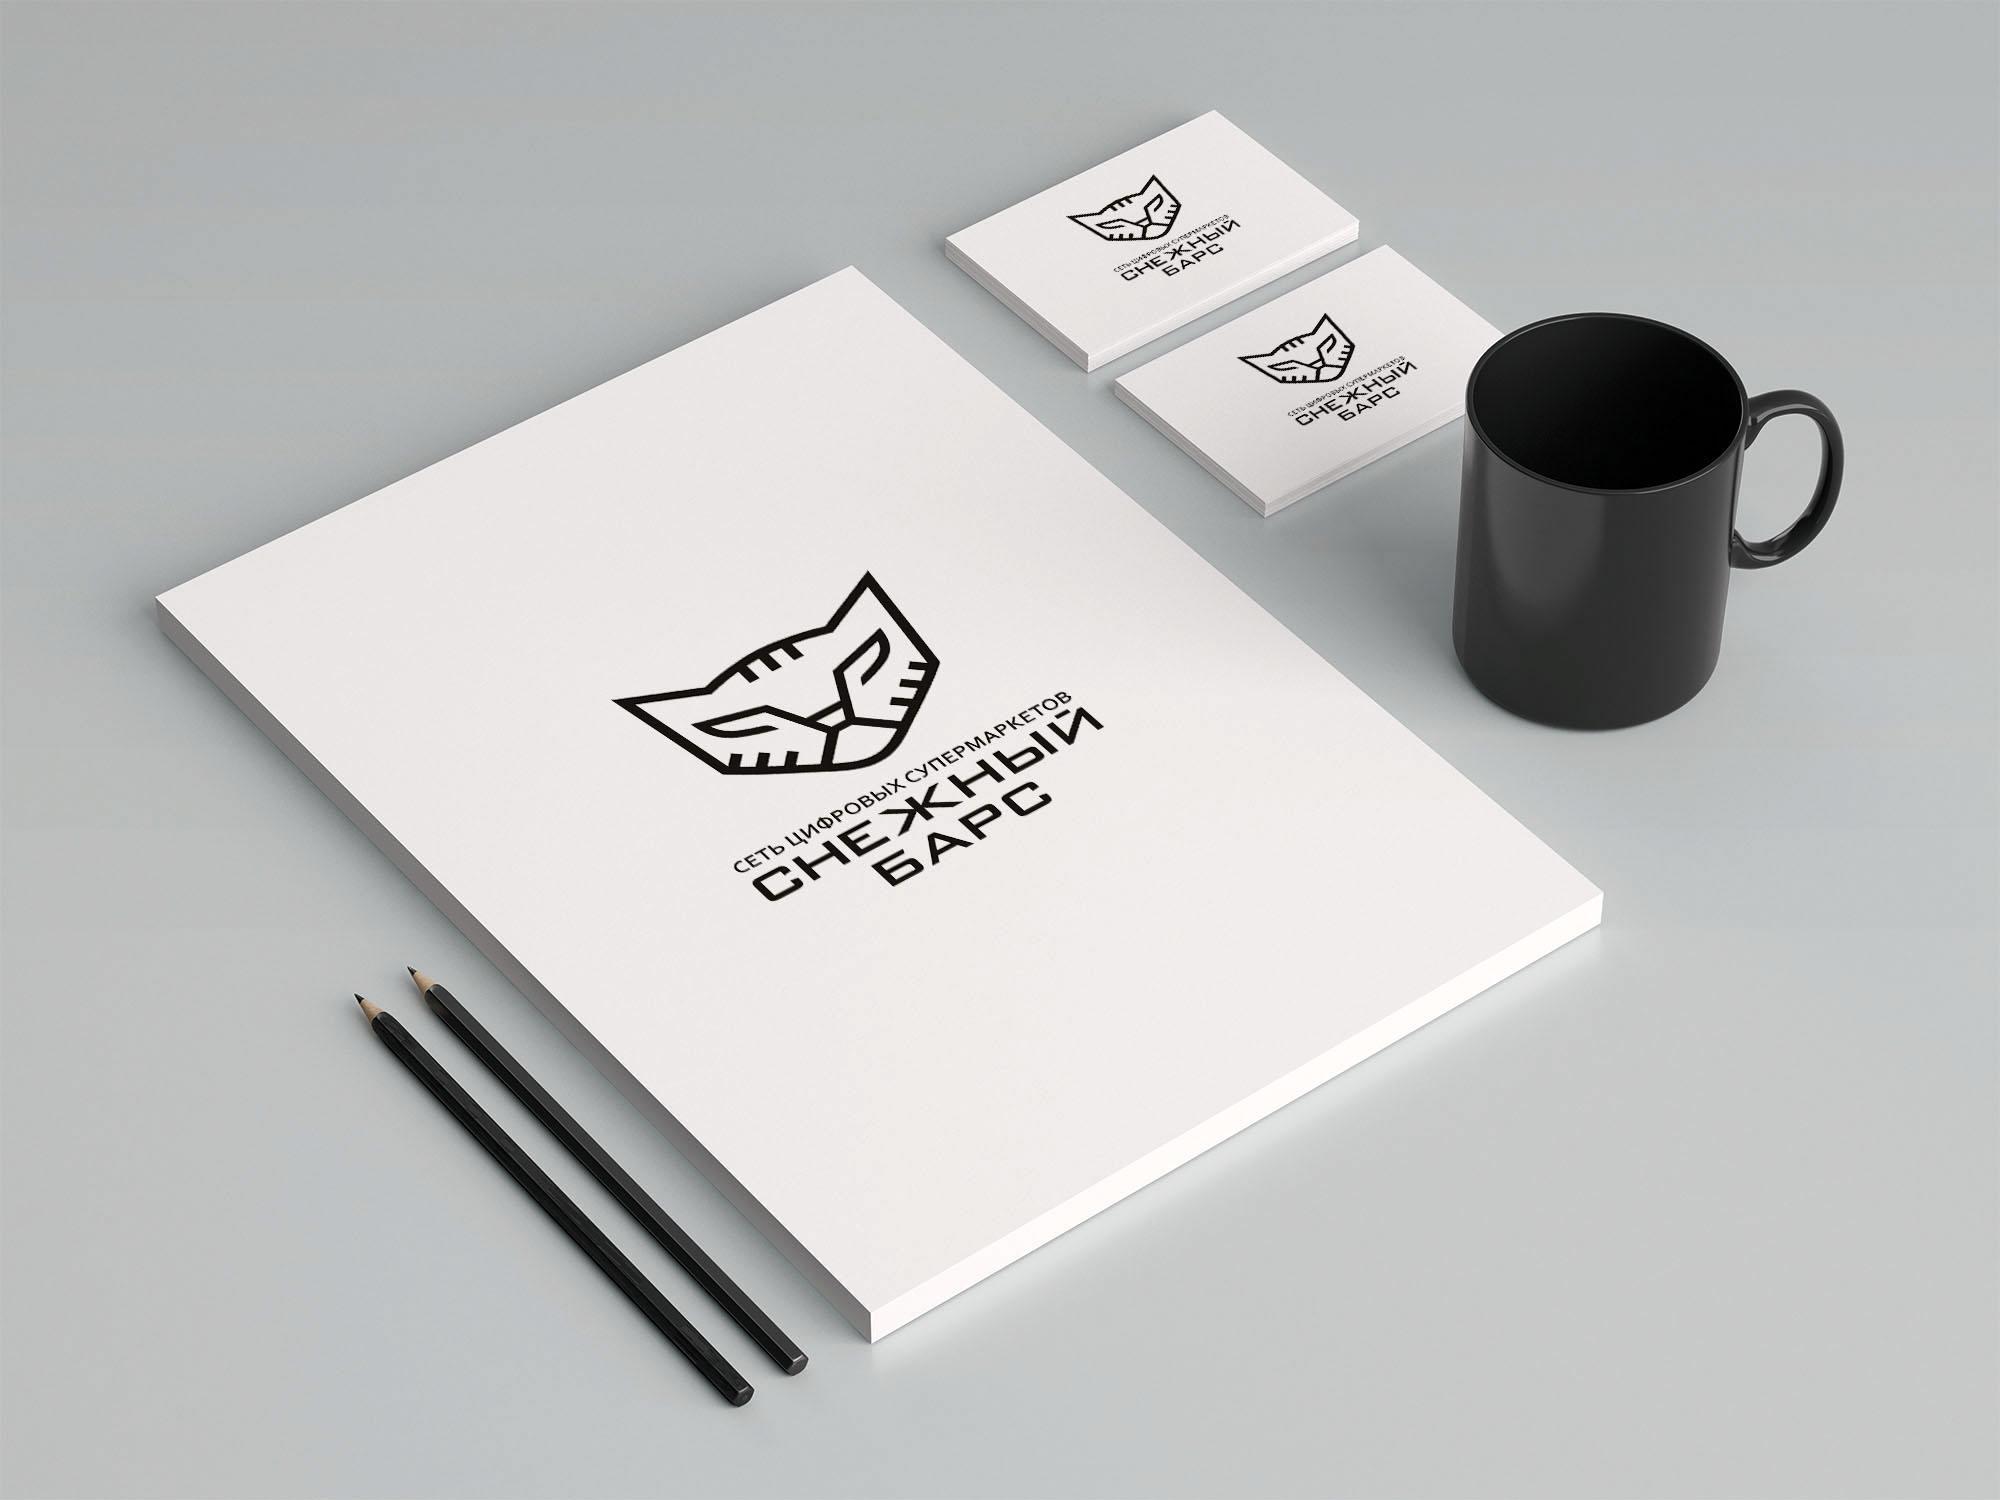 Ре-дизайн (рестайлинг) логотипа компании фото f_7725a990d8055b06.jpg